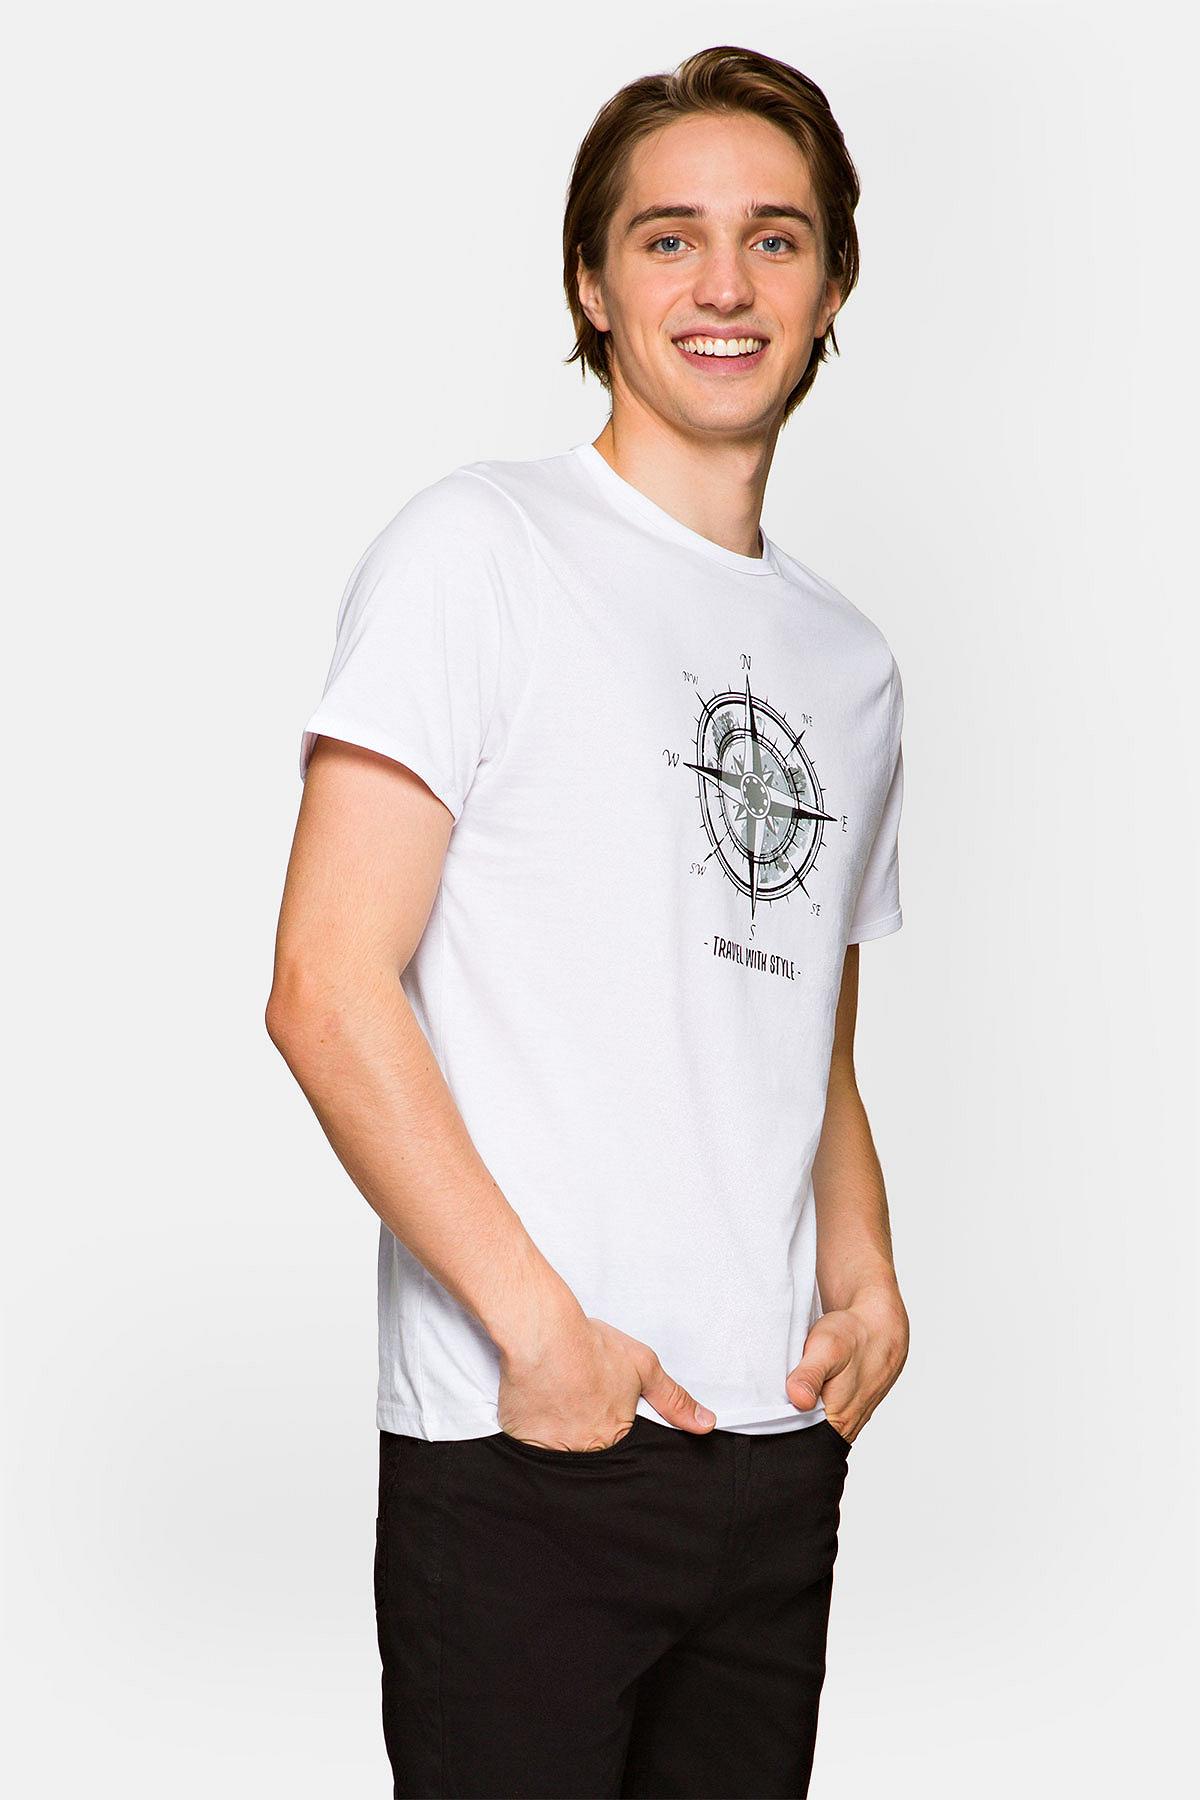 Koszulka Biała Elliott rozmiar 2XL; 3XL; 4XL; 5XL; L; M; XL